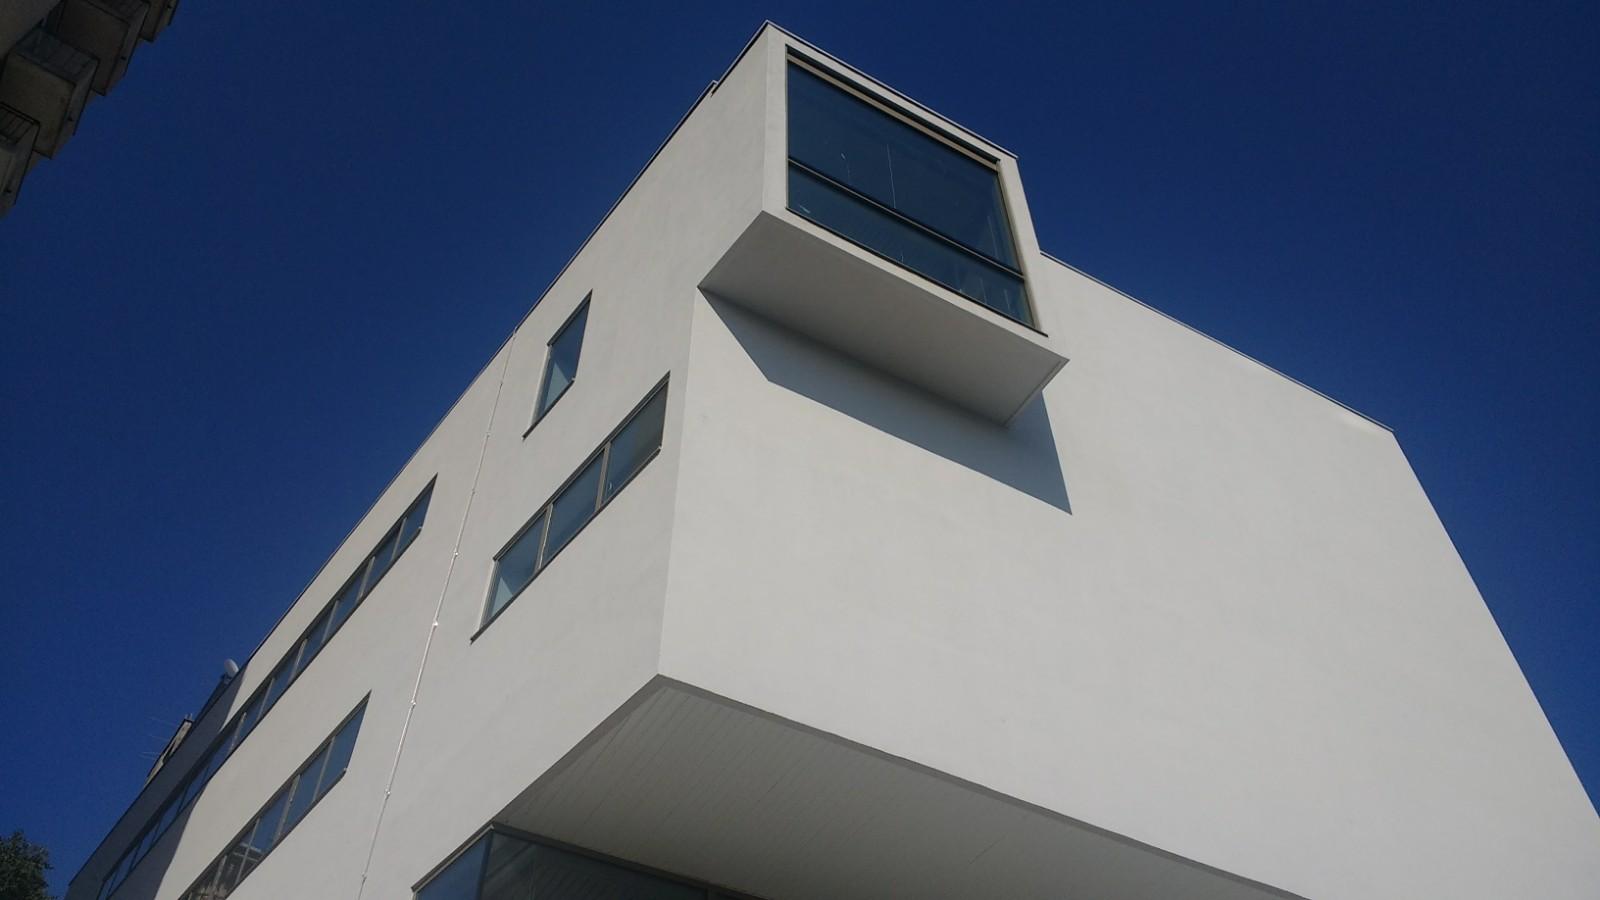 Završena energetska obnova zgrade Muzeja